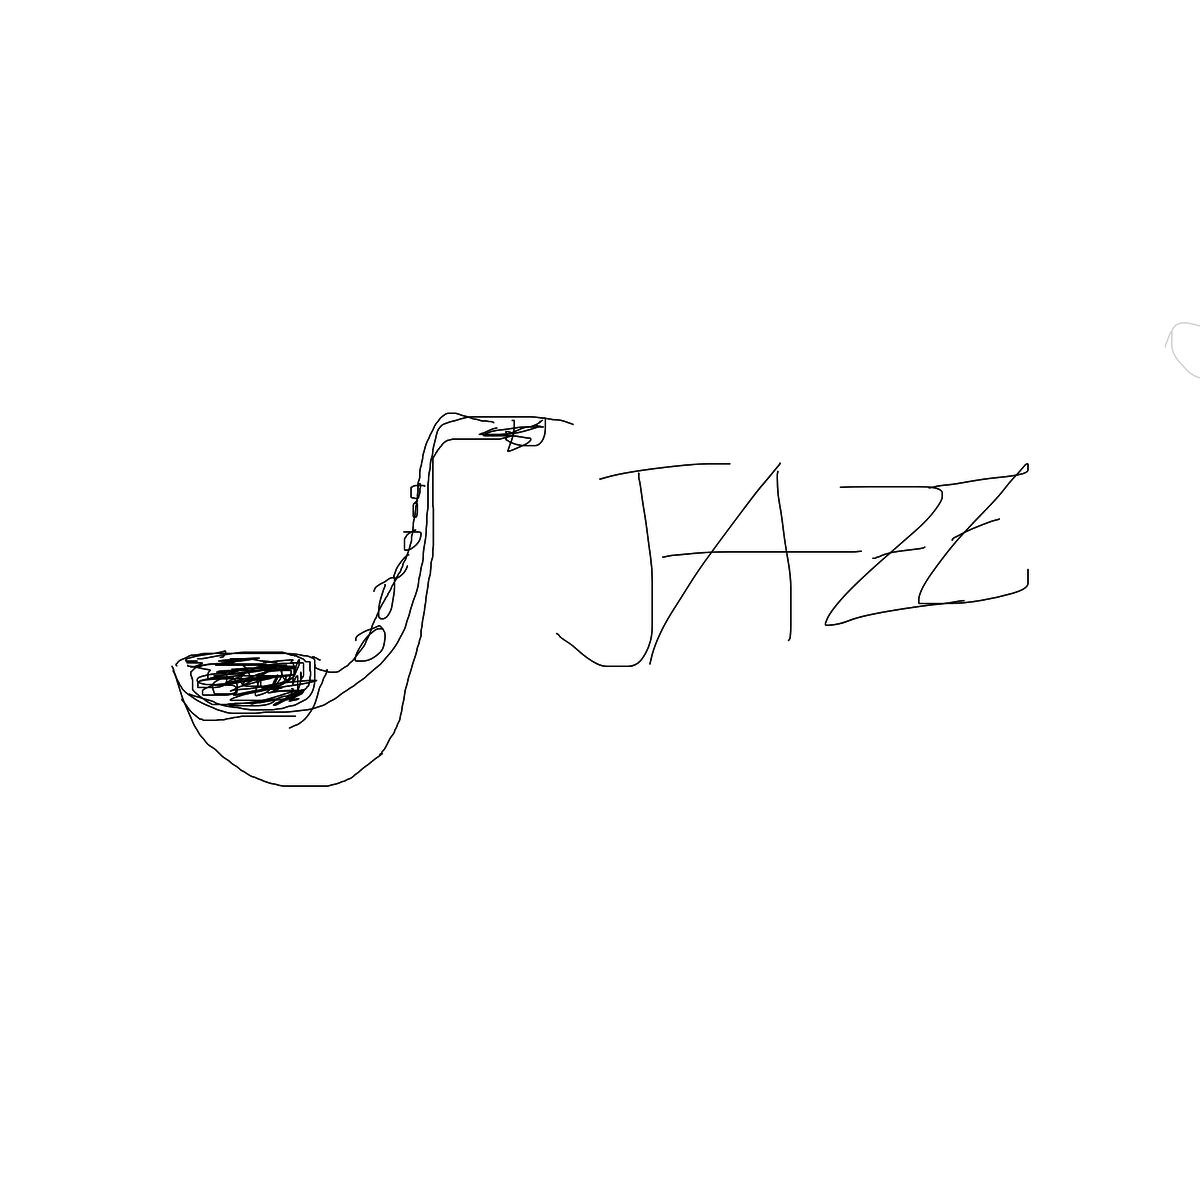 BAAAM drawing#24658 lat:52.4756126403808600lng: 13.4076280593872070